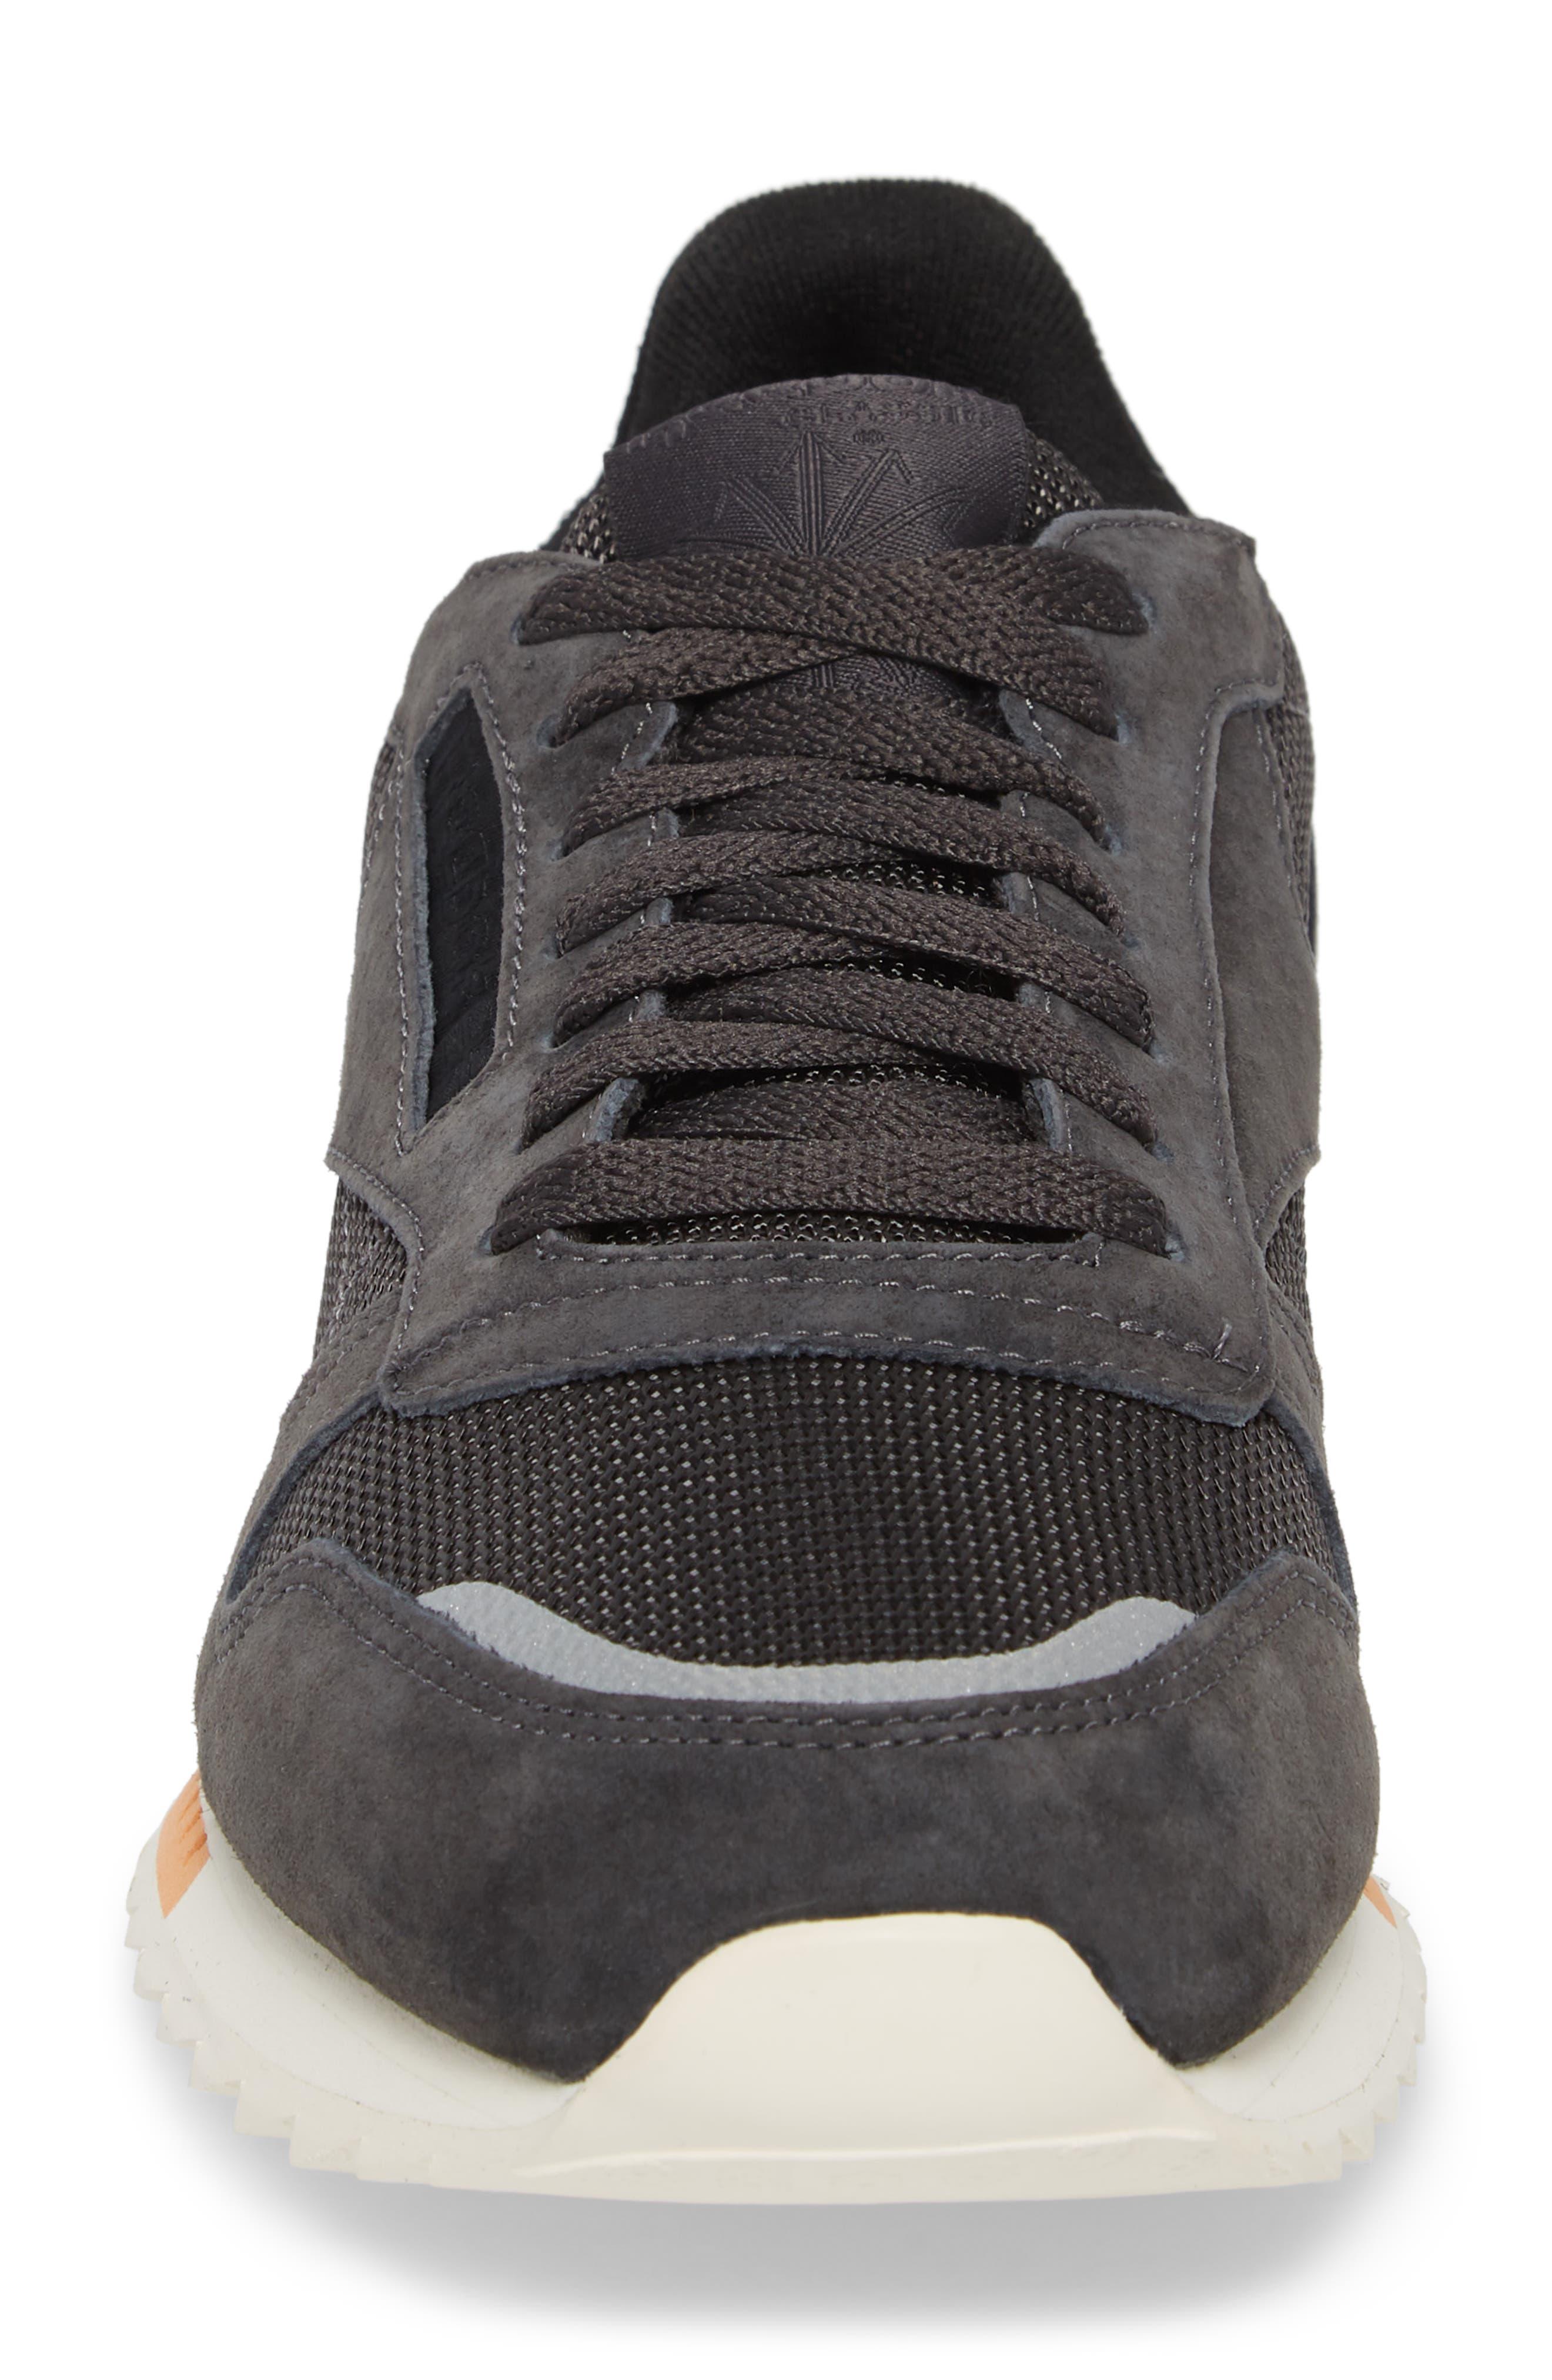 Classic Leather Ripple Sneaker,                             Alternate thumbnail 4, color,                             Coal/ Grey/ White/ Black/ Dust